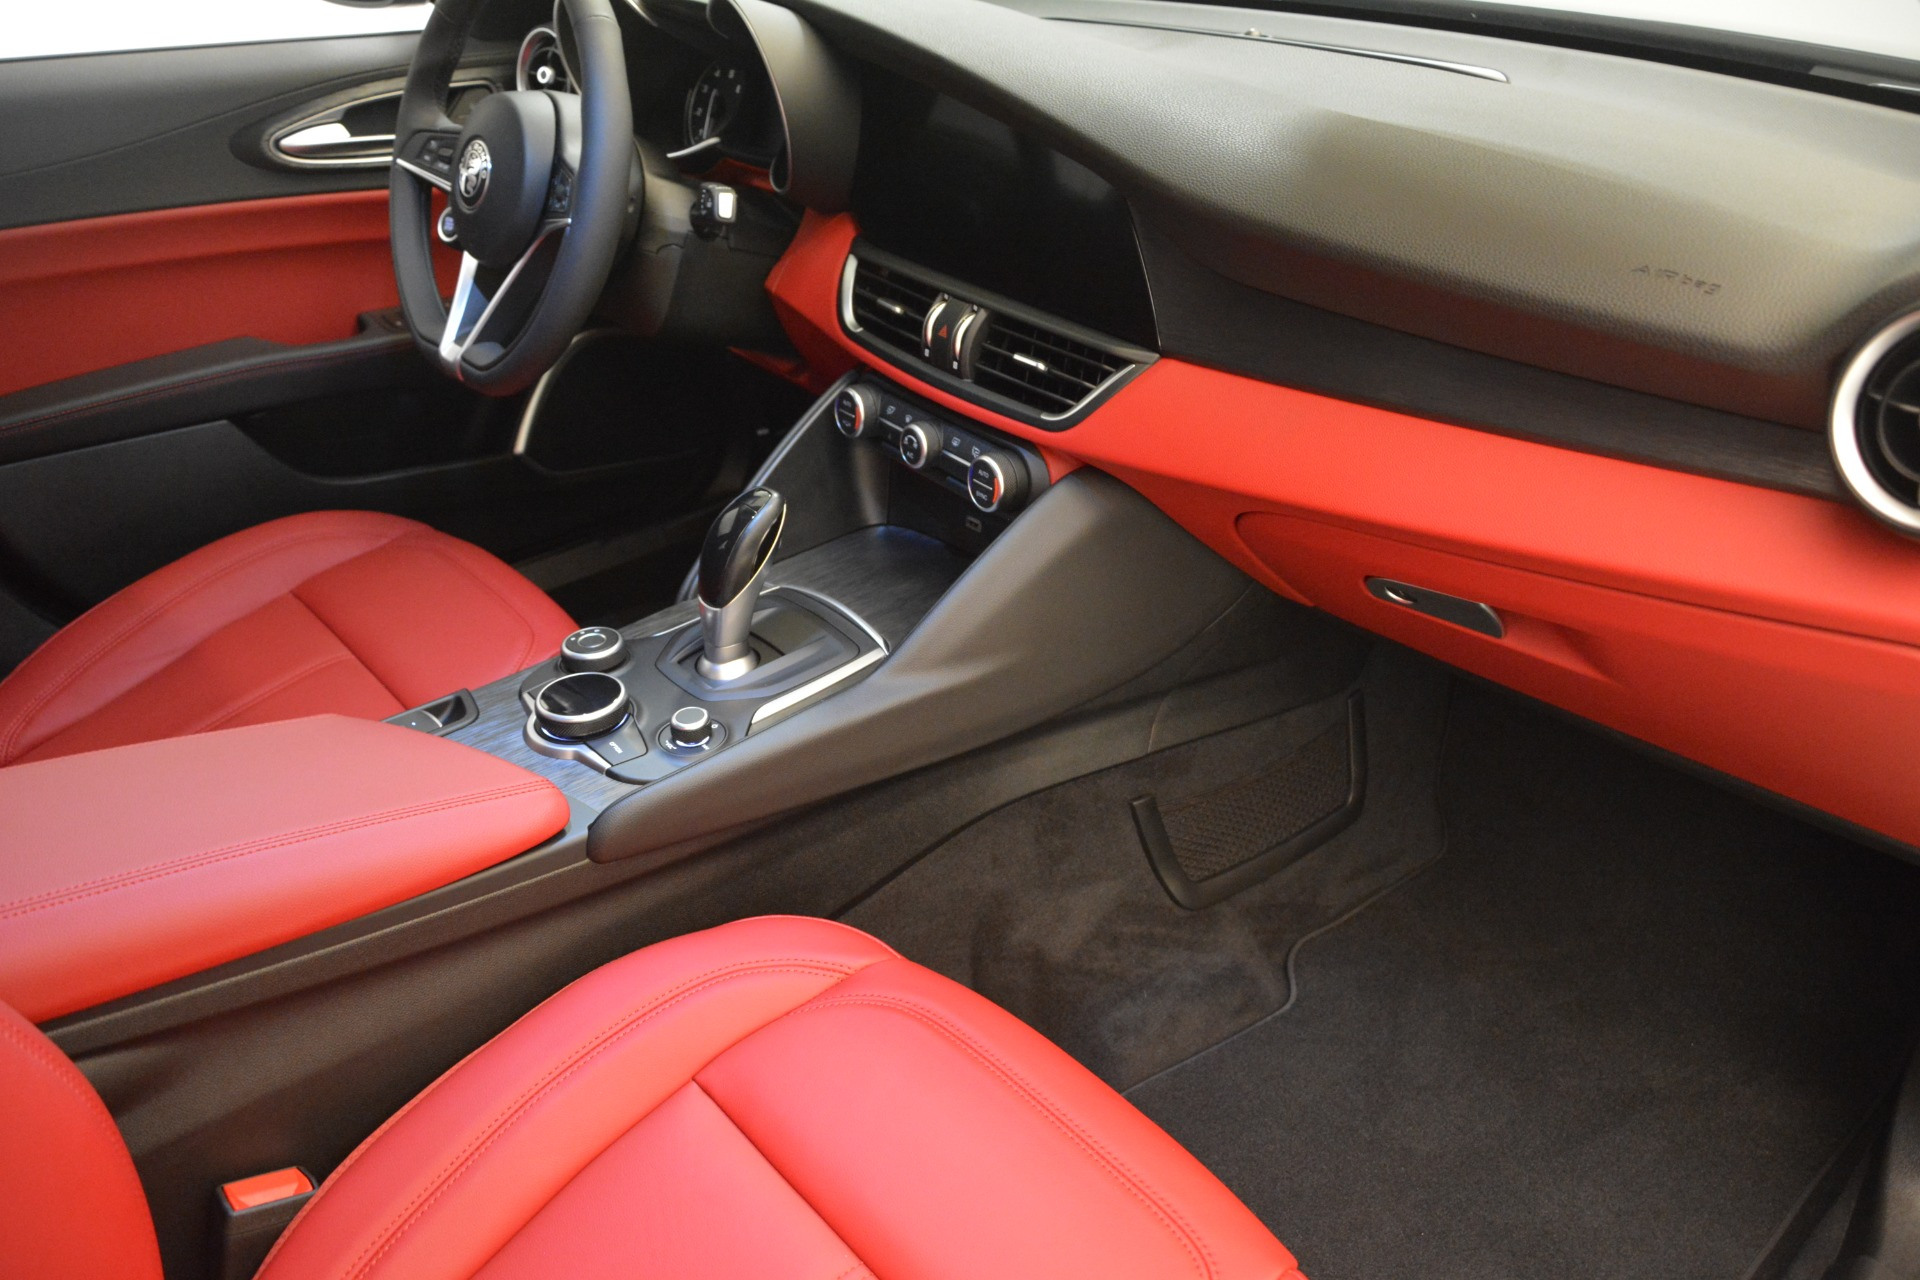 2018 Alfa Romeo Giulia Q4 Stock LW221 for sale near Westport CT